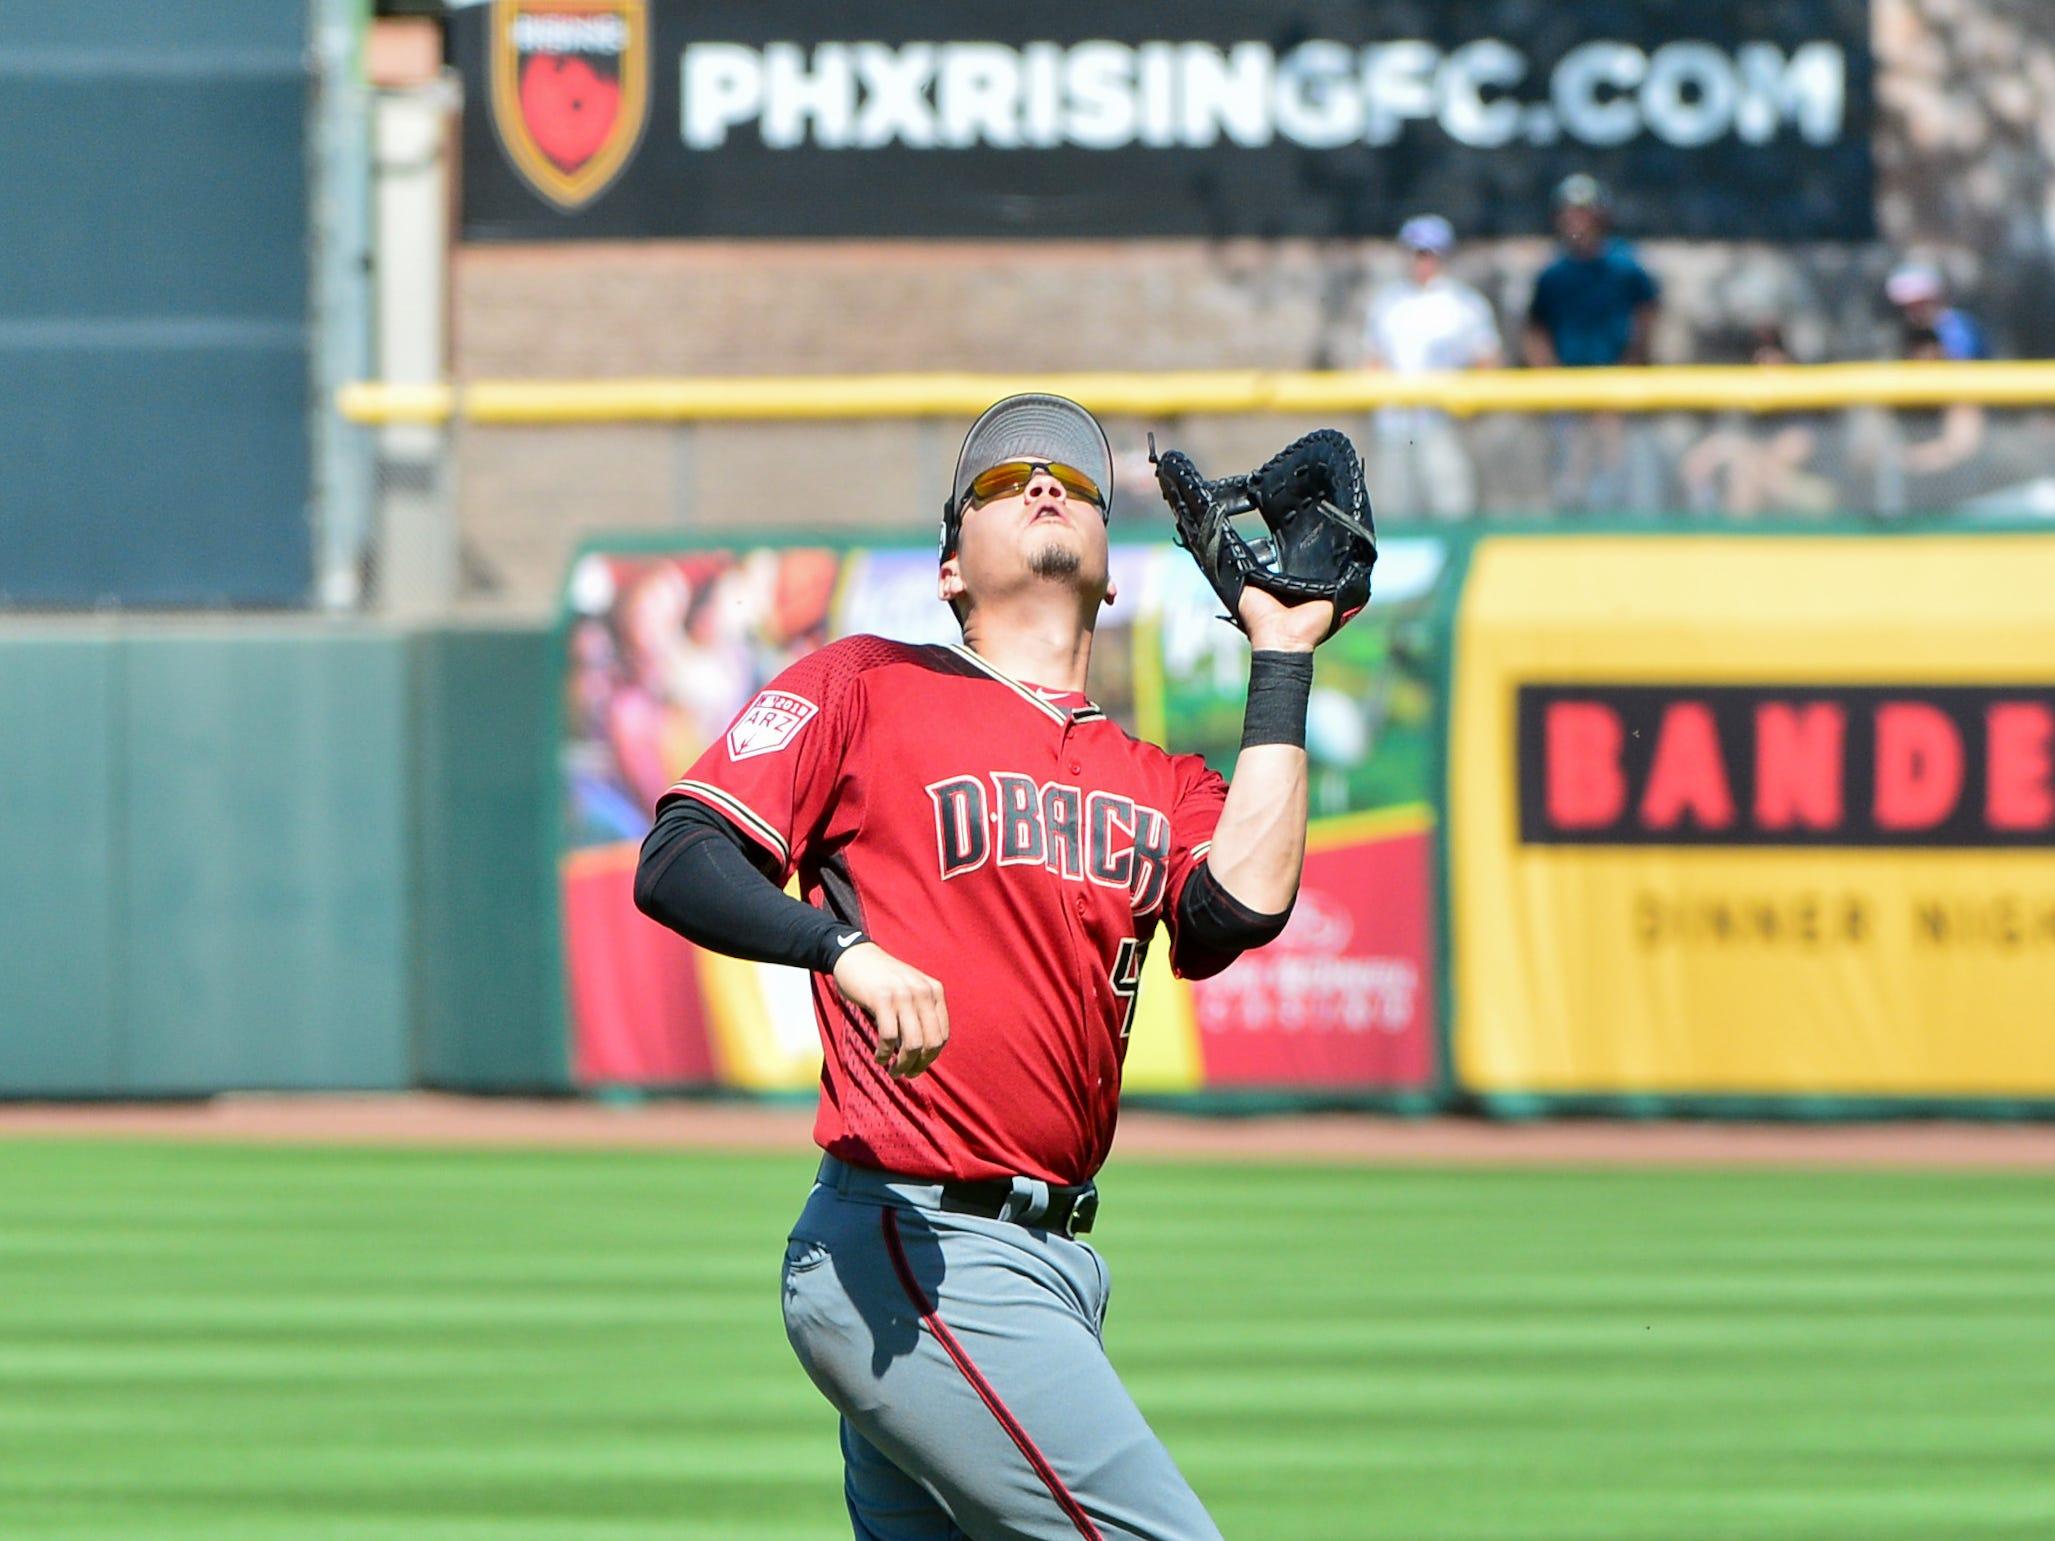 Mar 23, 2019; Scottsdale, AZ, USA; Arizona Diamondbacks third baseman Wilmer Flores (41) catches a fly ball during the third inning against the San Francisco Giants at Scottsdale Stadium.